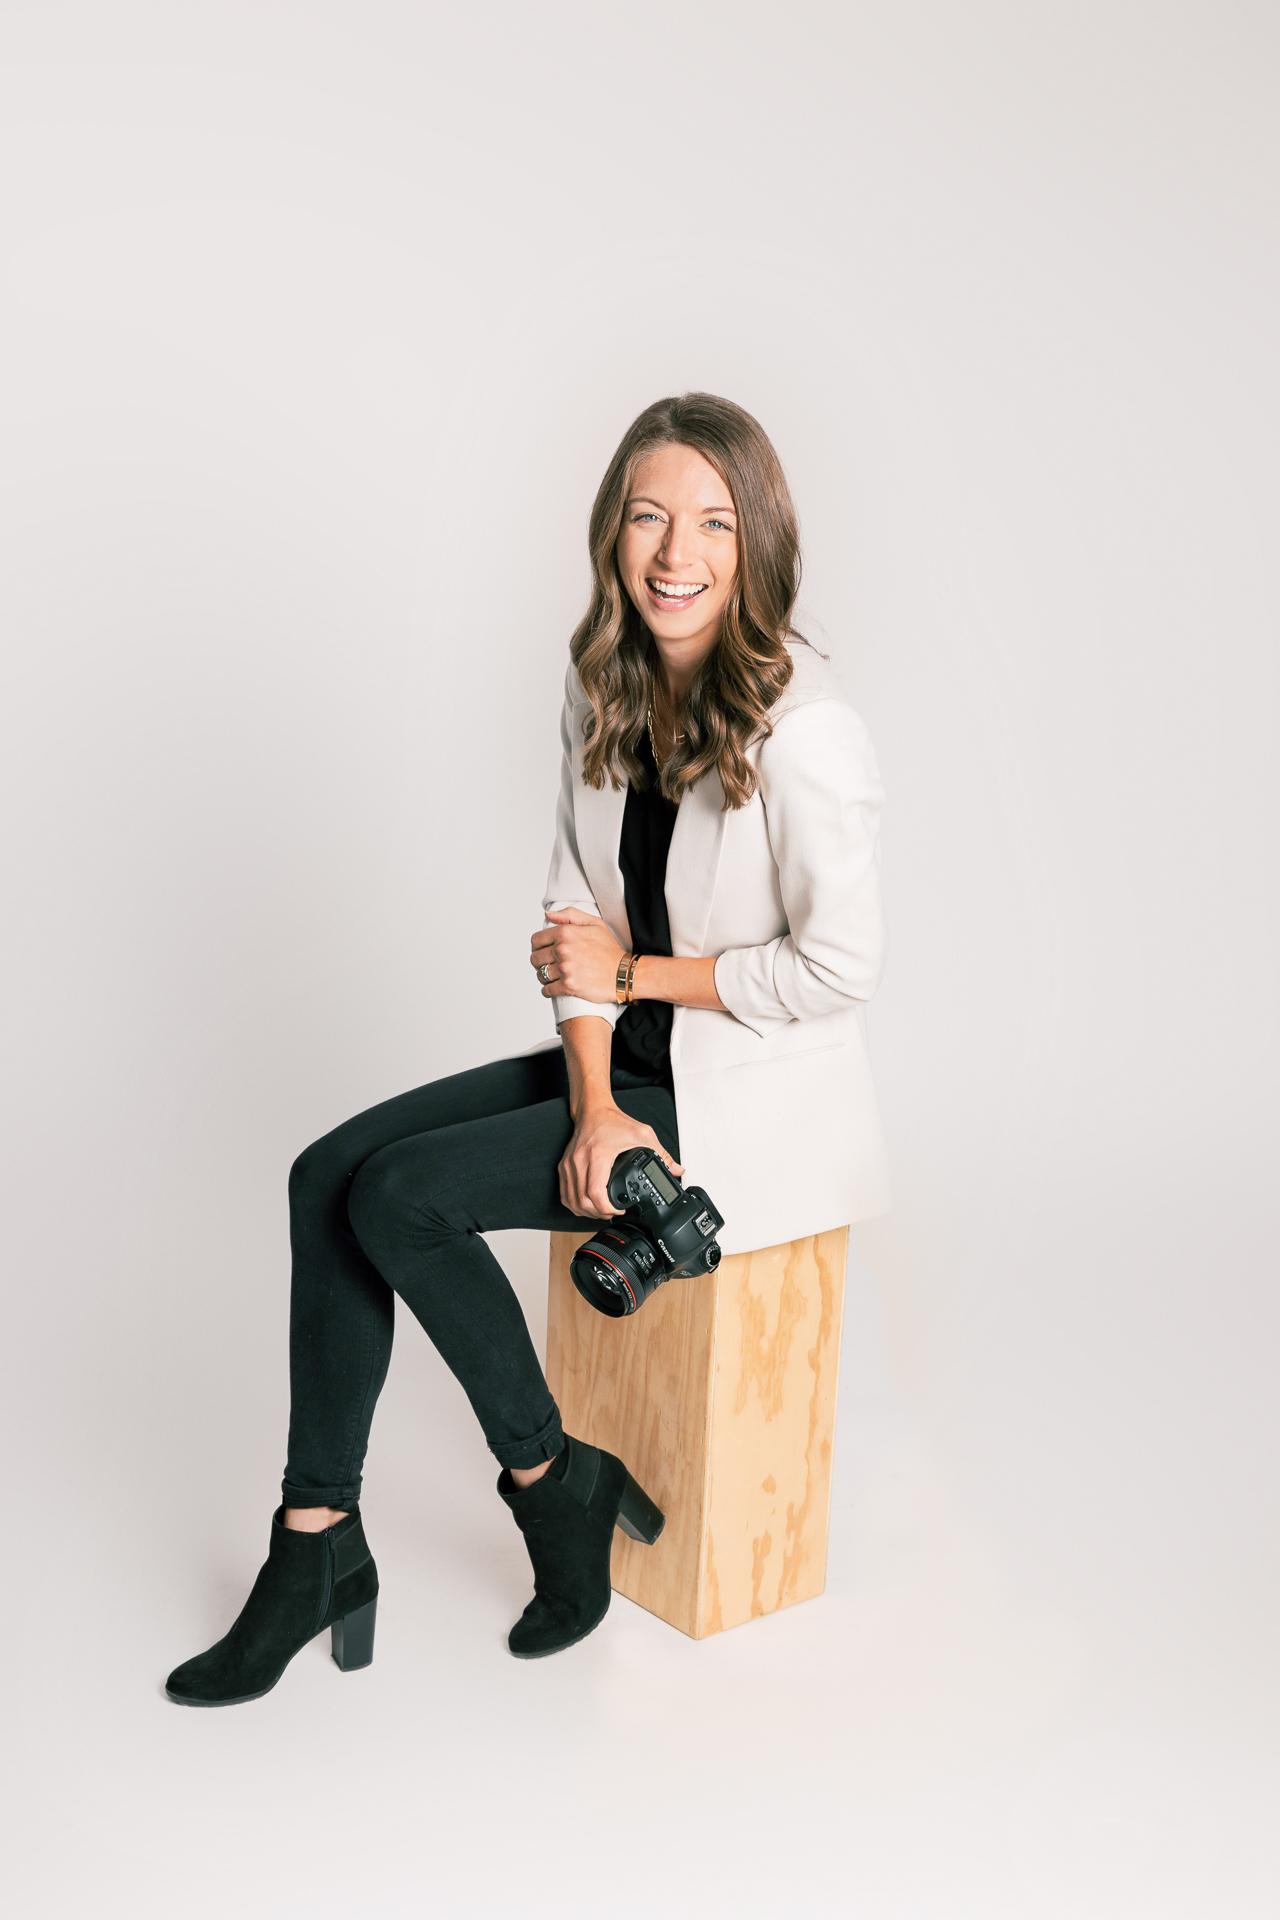 Becky Dean, Wedding Photographer at Pen and Lens Photography